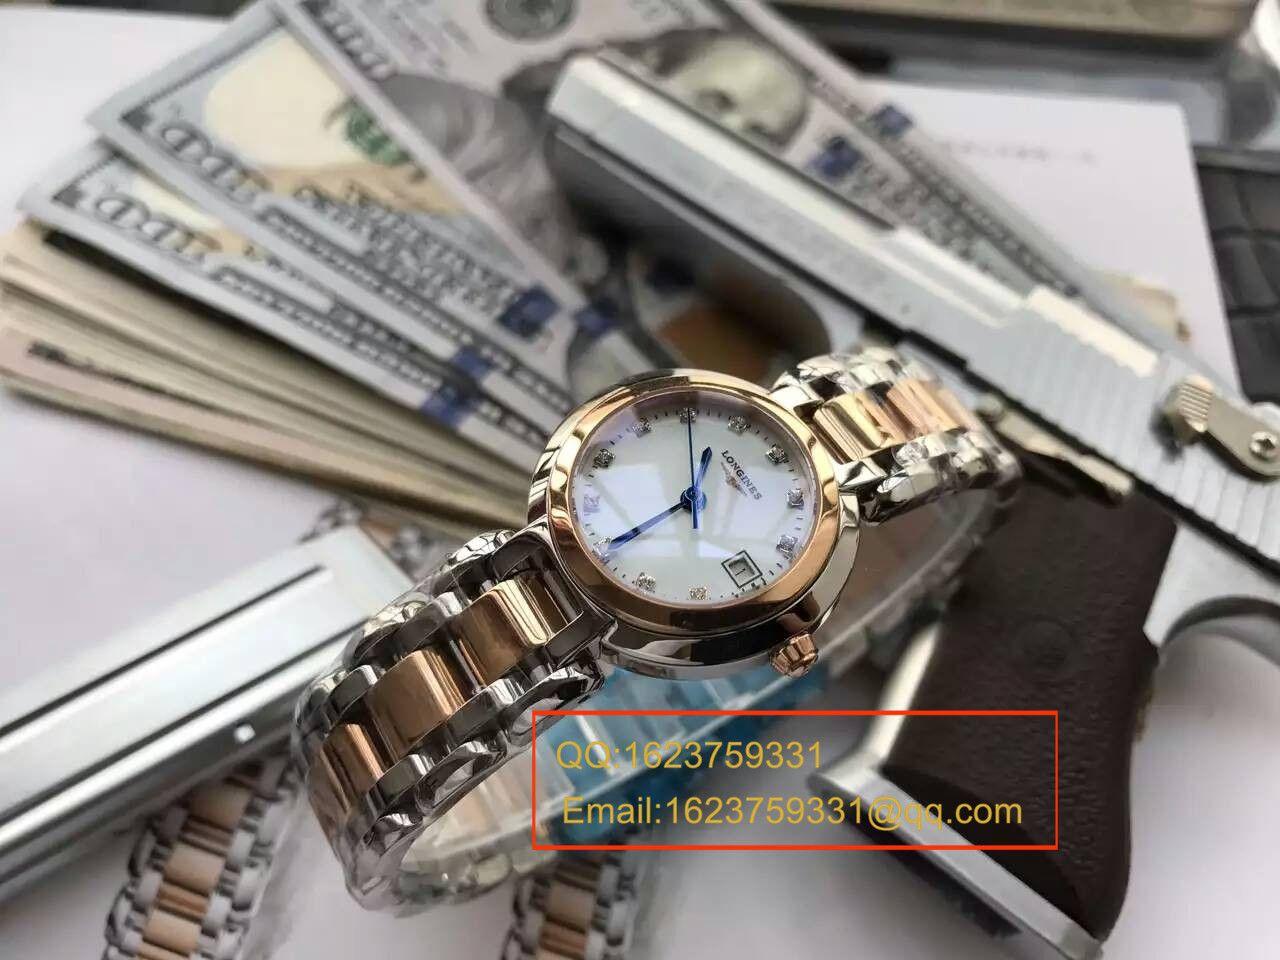 【KZ台湾厂一比一精仿手表】浪琴优雅 PRIMALUNA心月系列L8.109.5.87.6腕表